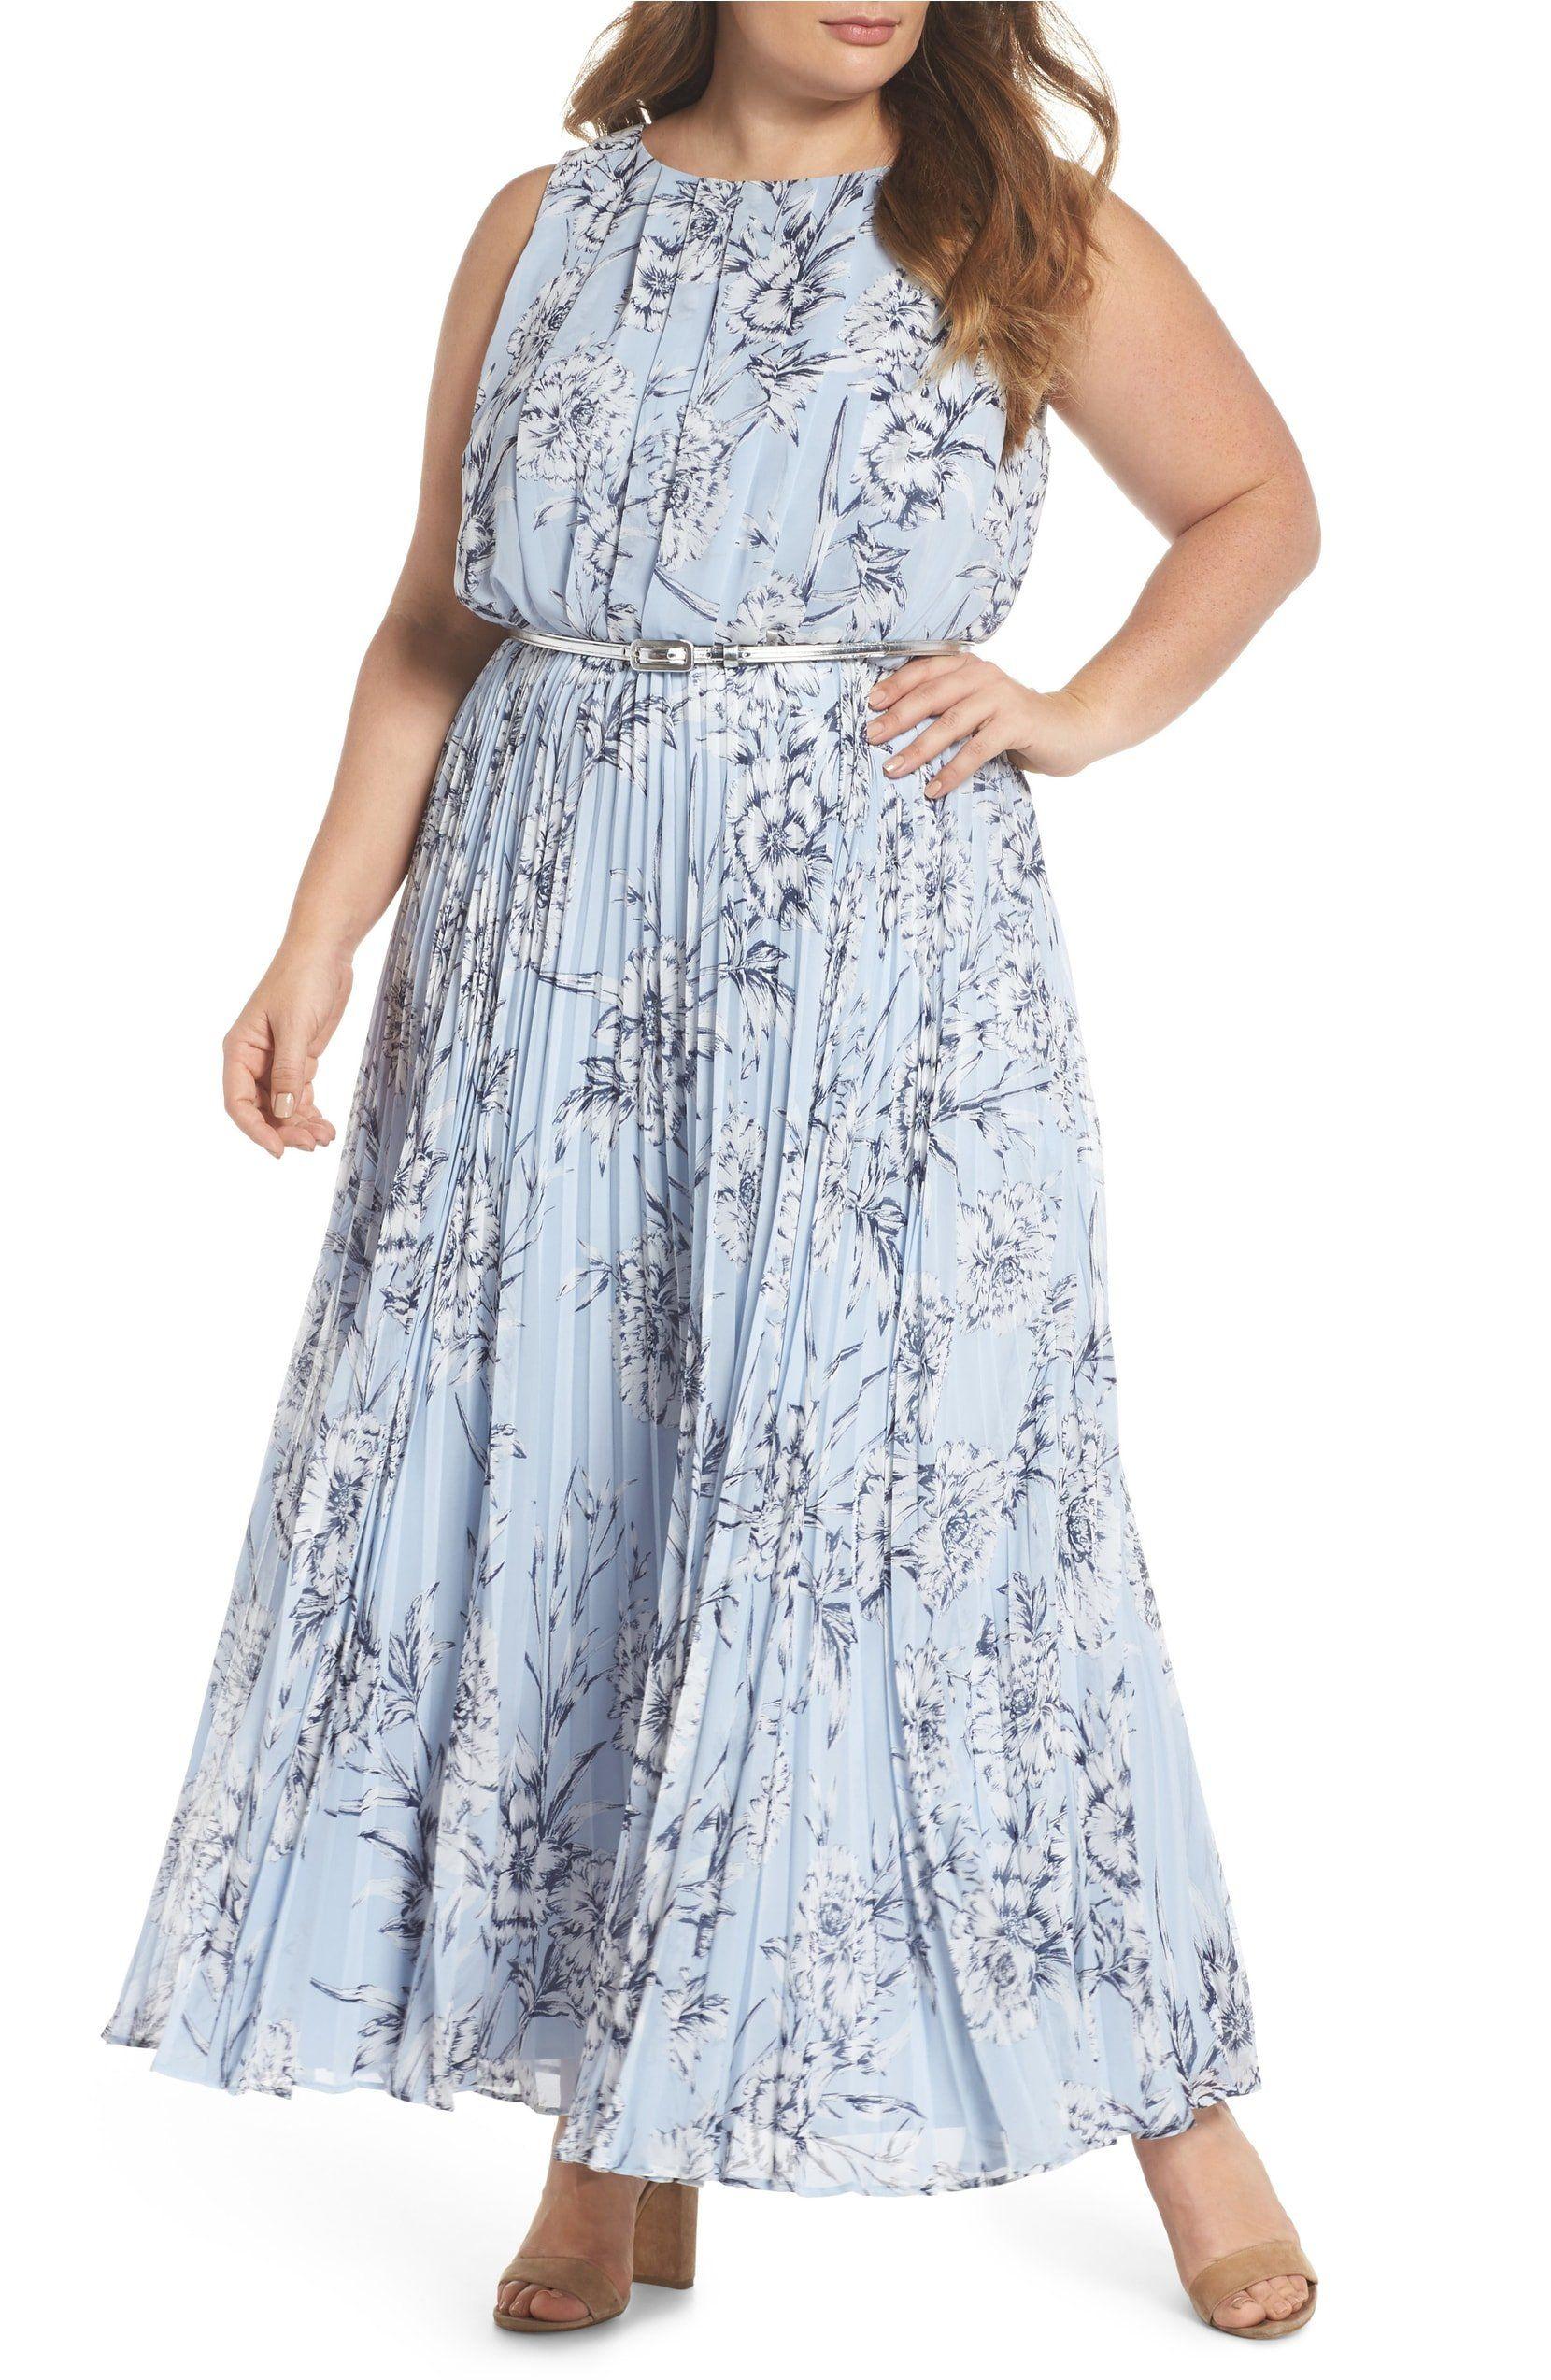 aec4776abc Eliza J Floral Maxi Dress Plus Size - Data Dynamic AG